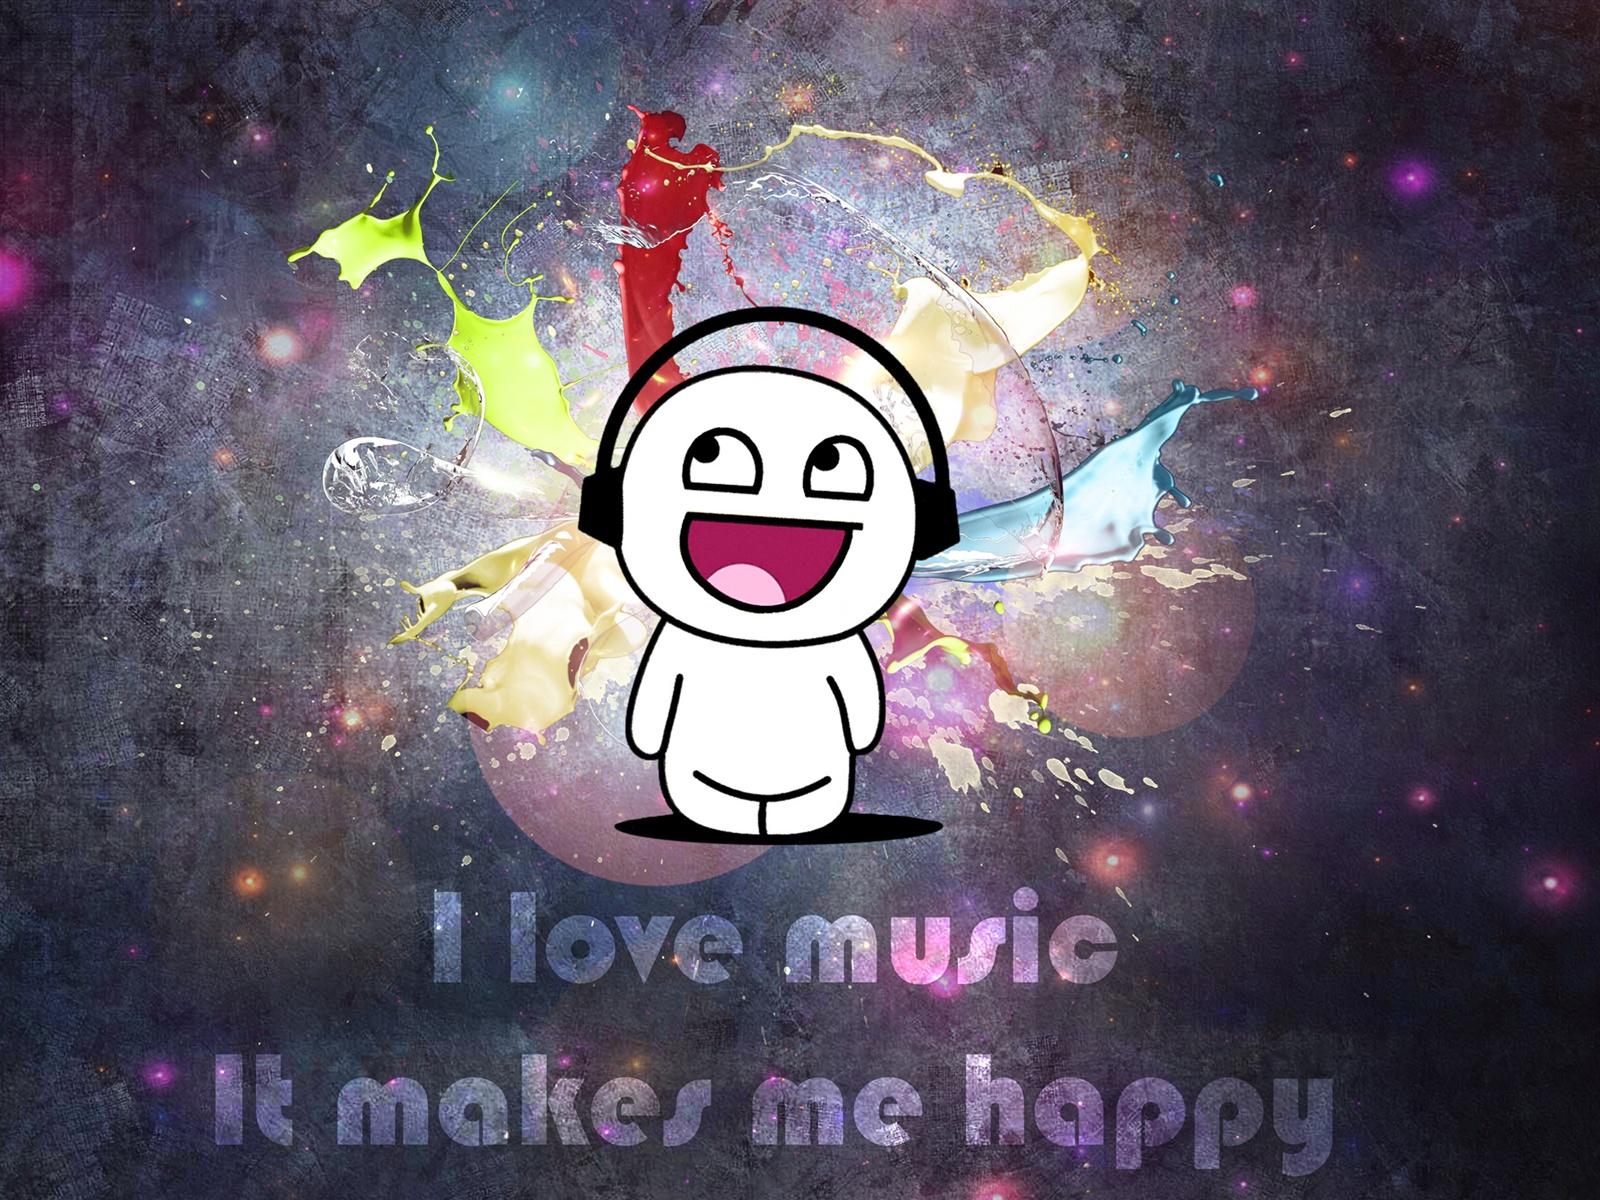 Wallpaper I Love Music, It Makes Me Happy 2560x1600 HD